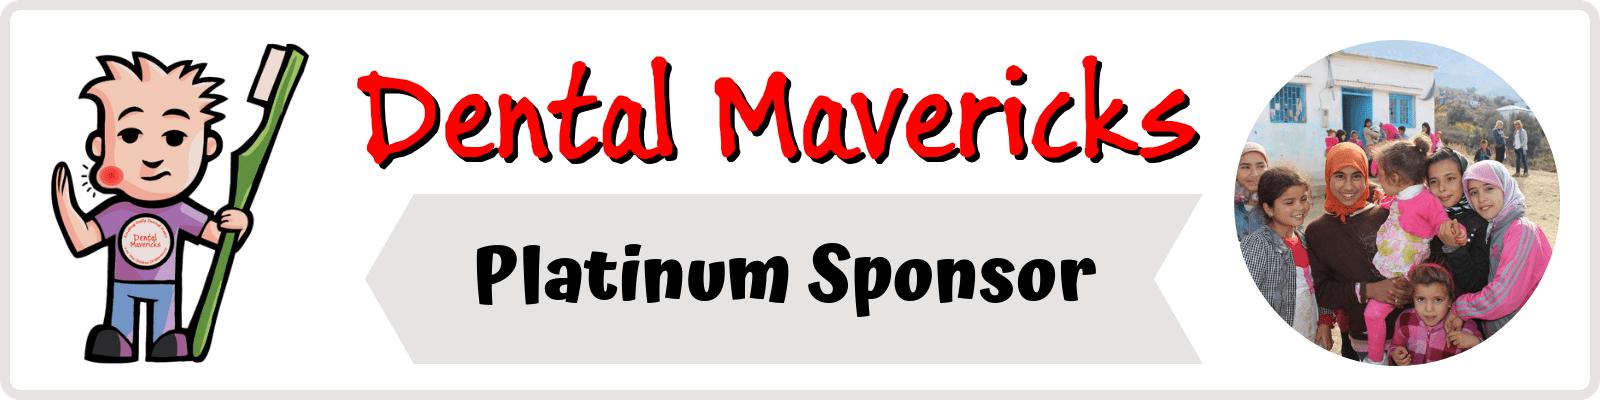 Clifton Dental Studio Are Platinum Sponsors Of Dental Mavericks